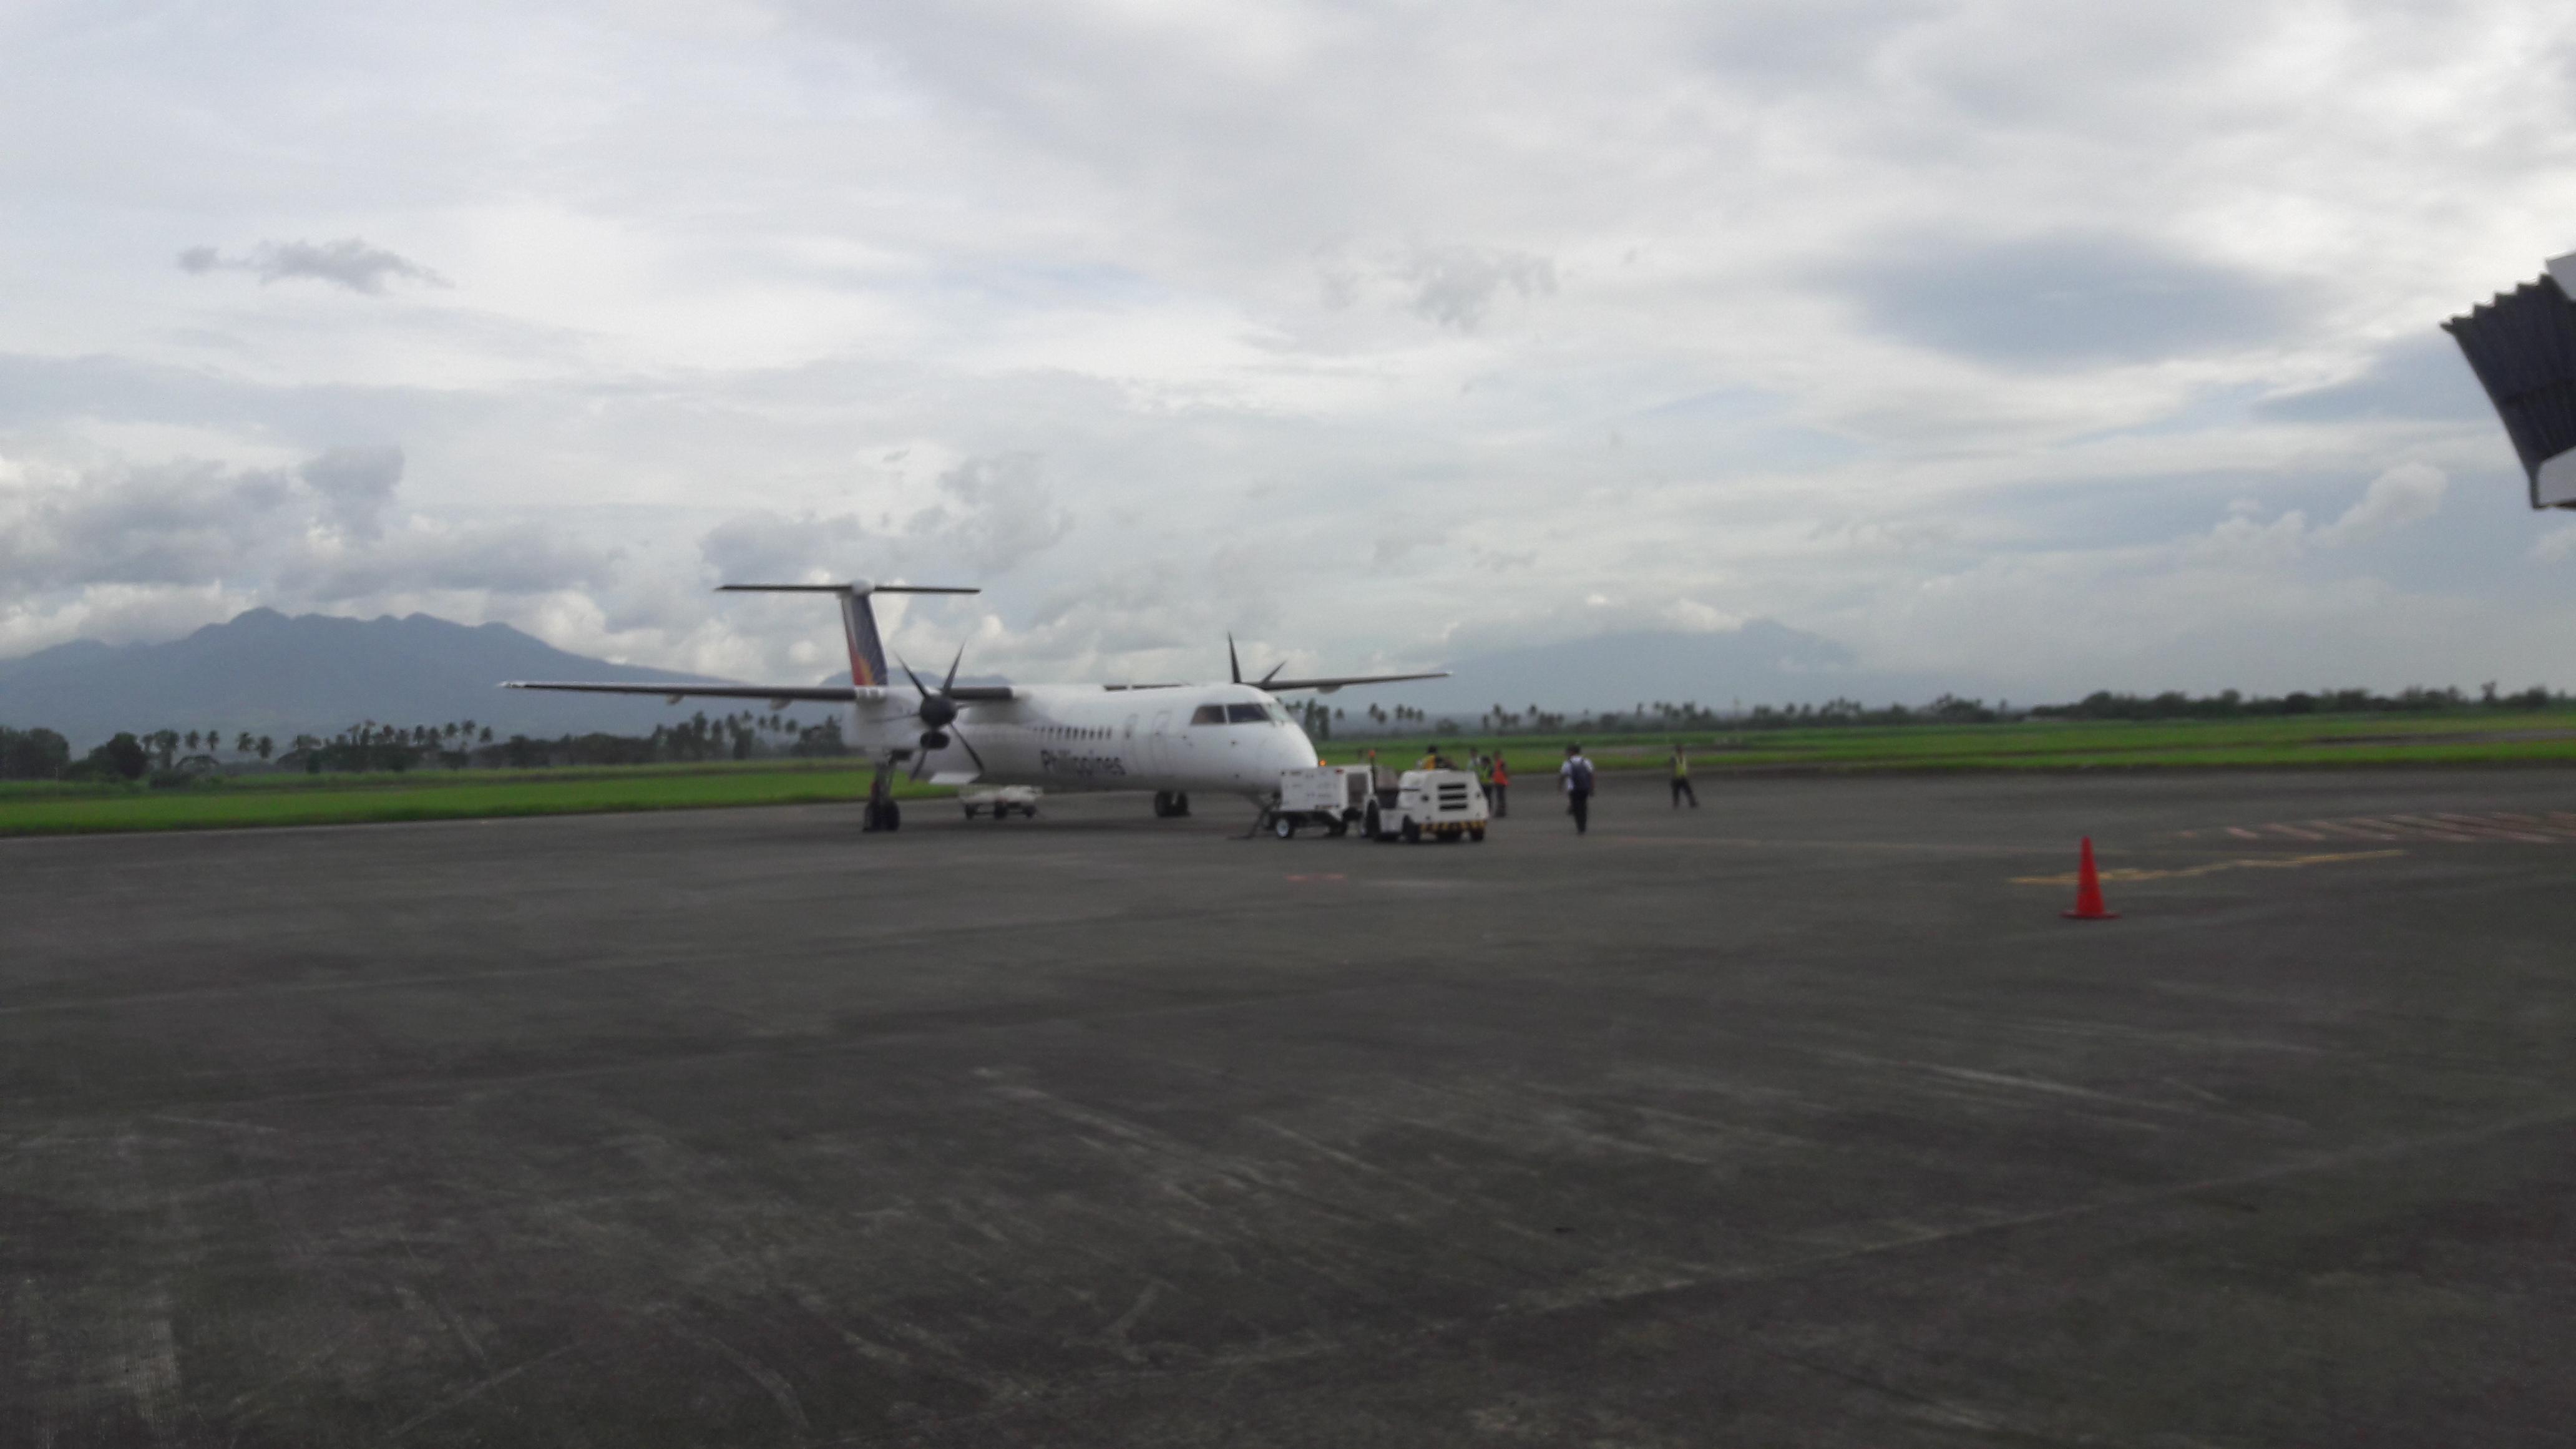 bacolod aiport bombardier Q400 to cebu jan18